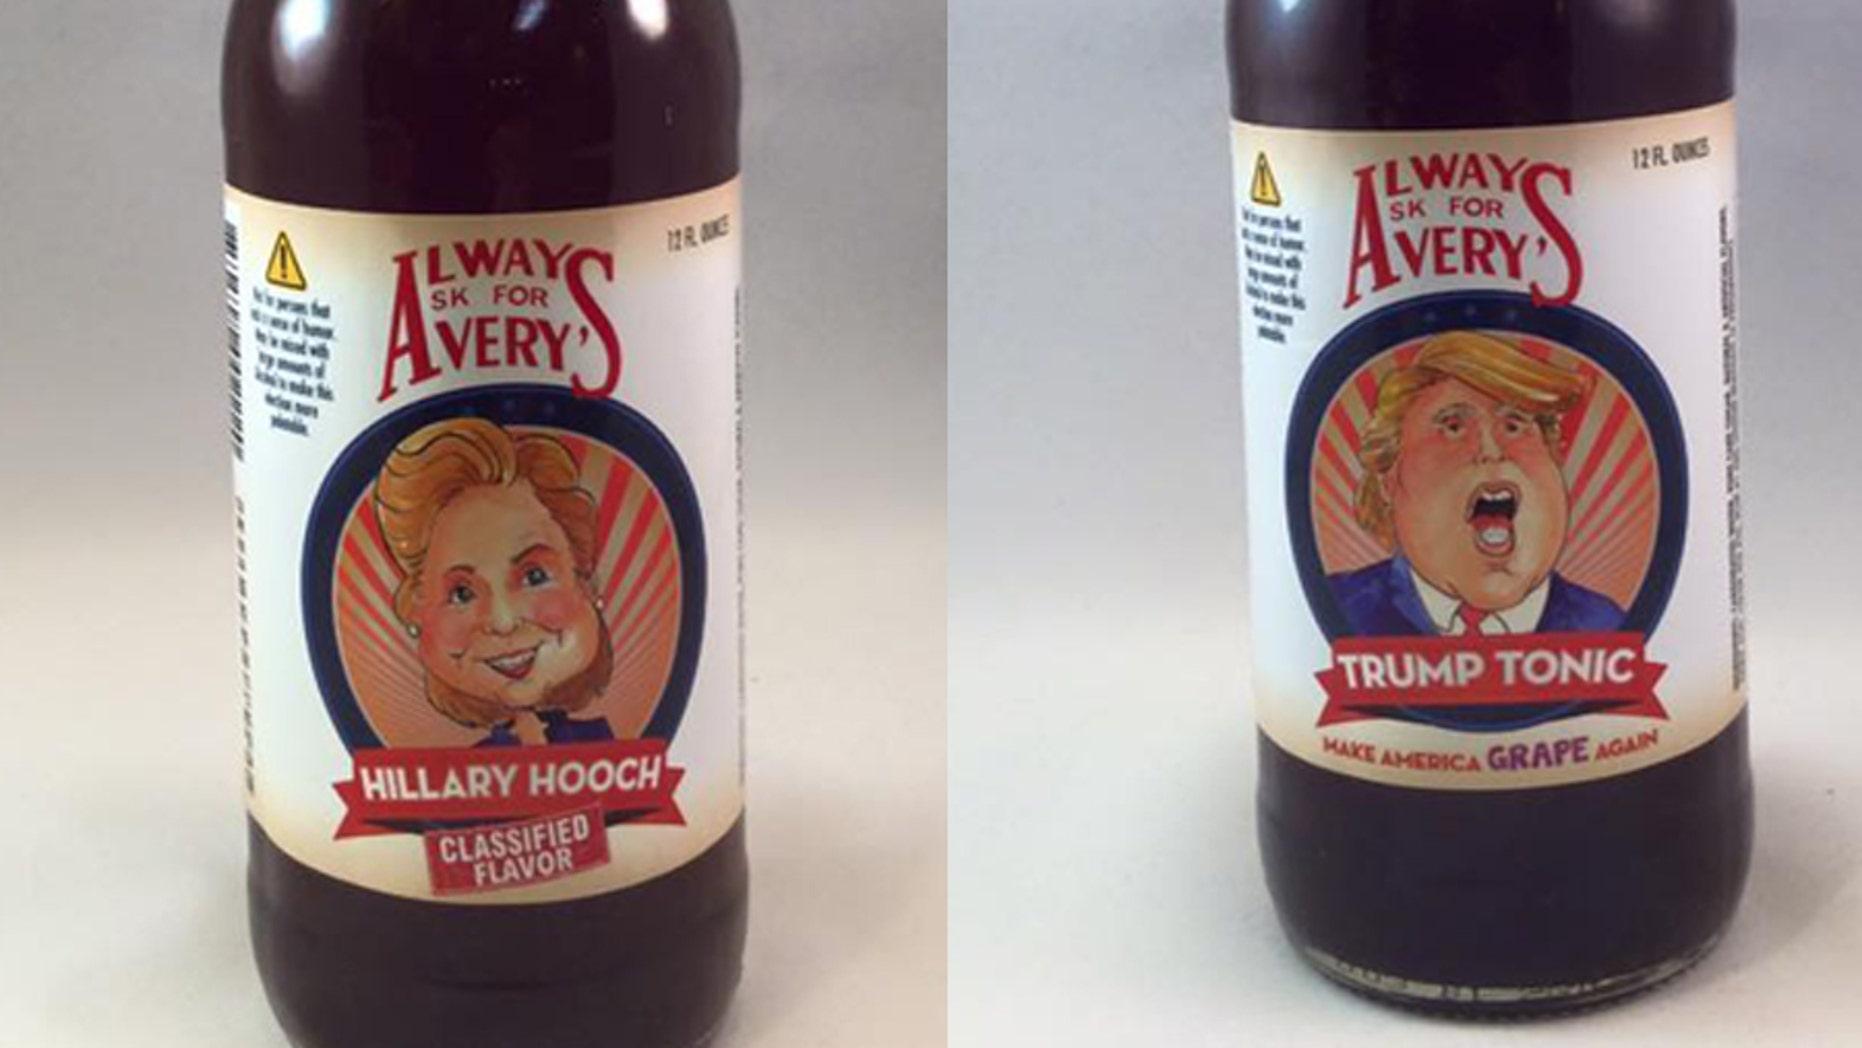 Hillary Hooch is a raspberry, lemon soda while Trump Tonic is a super sour grape.